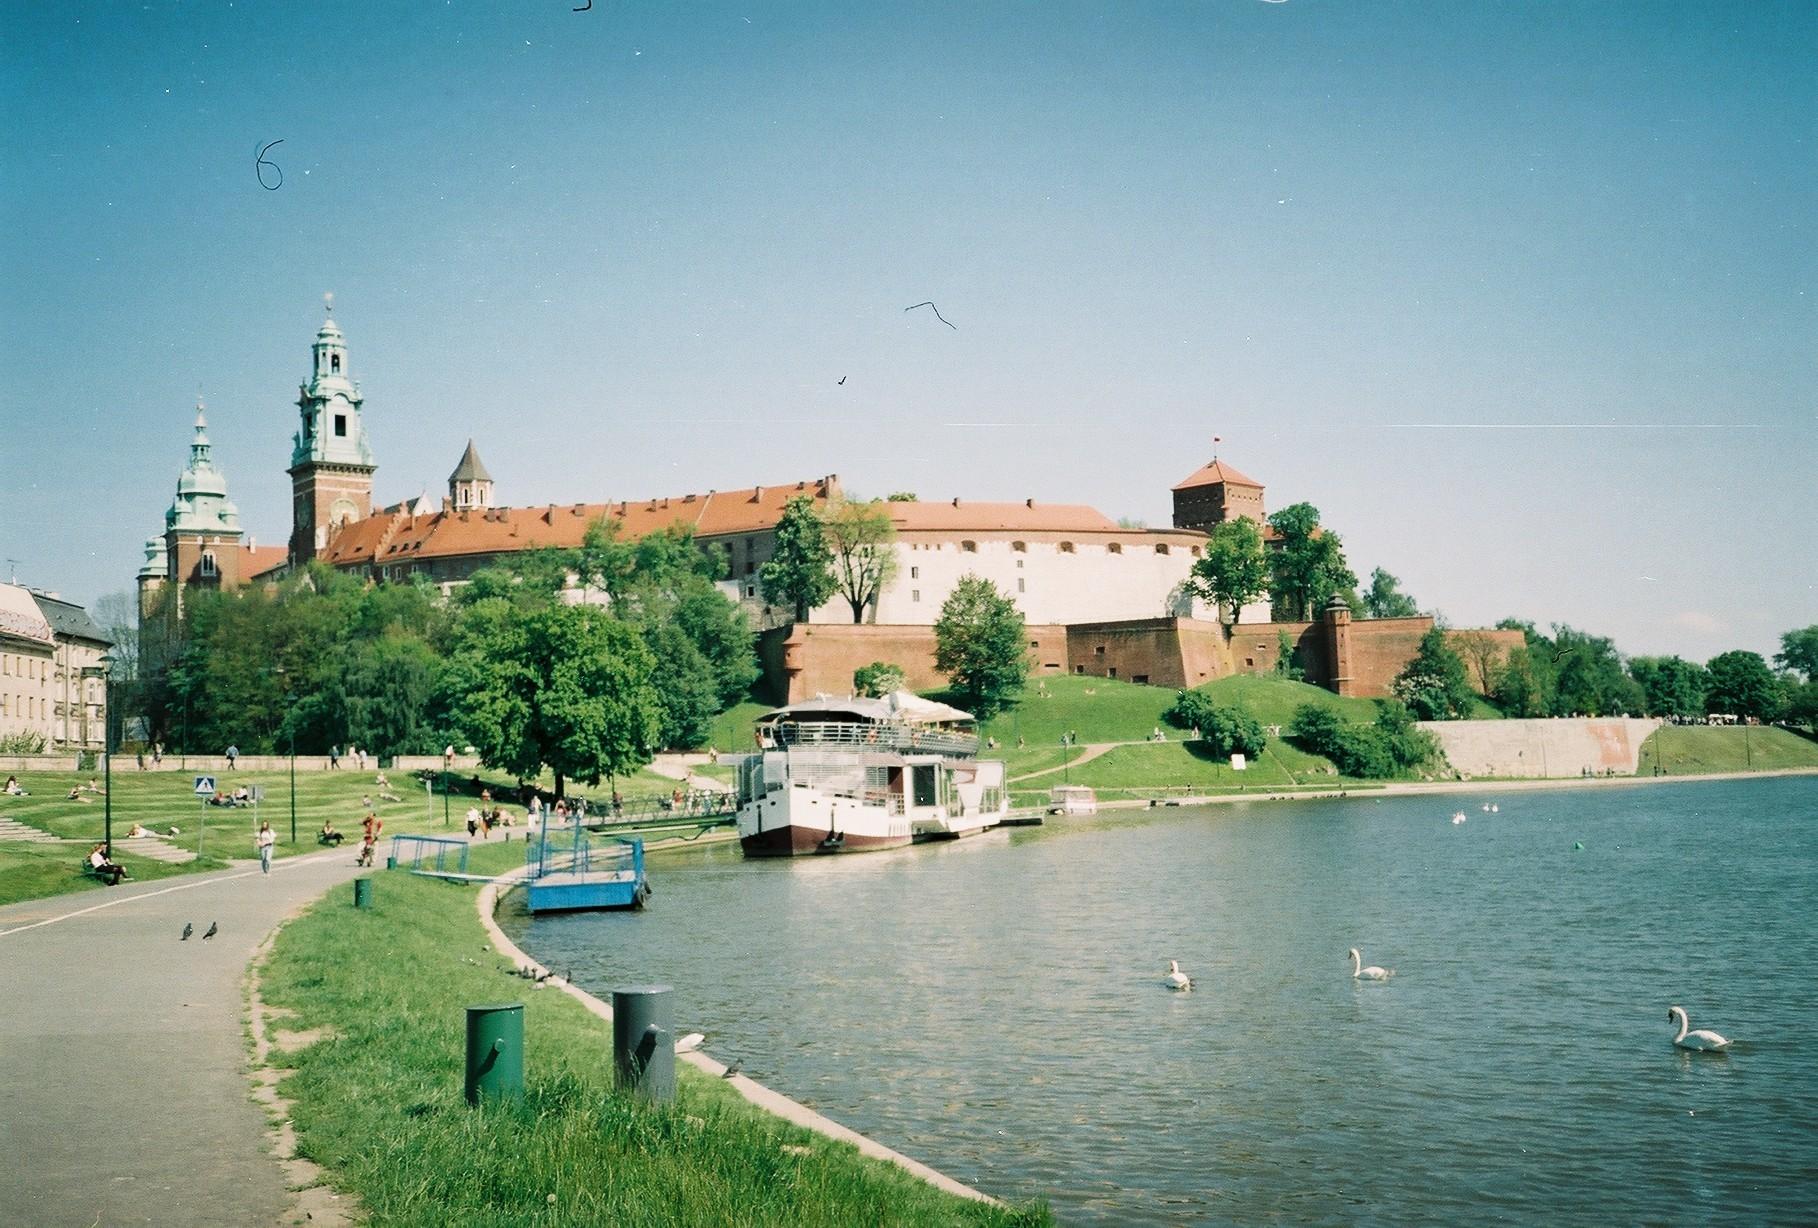 ¡Erasmus en Cracovia, Polonia! | Experiencia Erasmus Cracovia